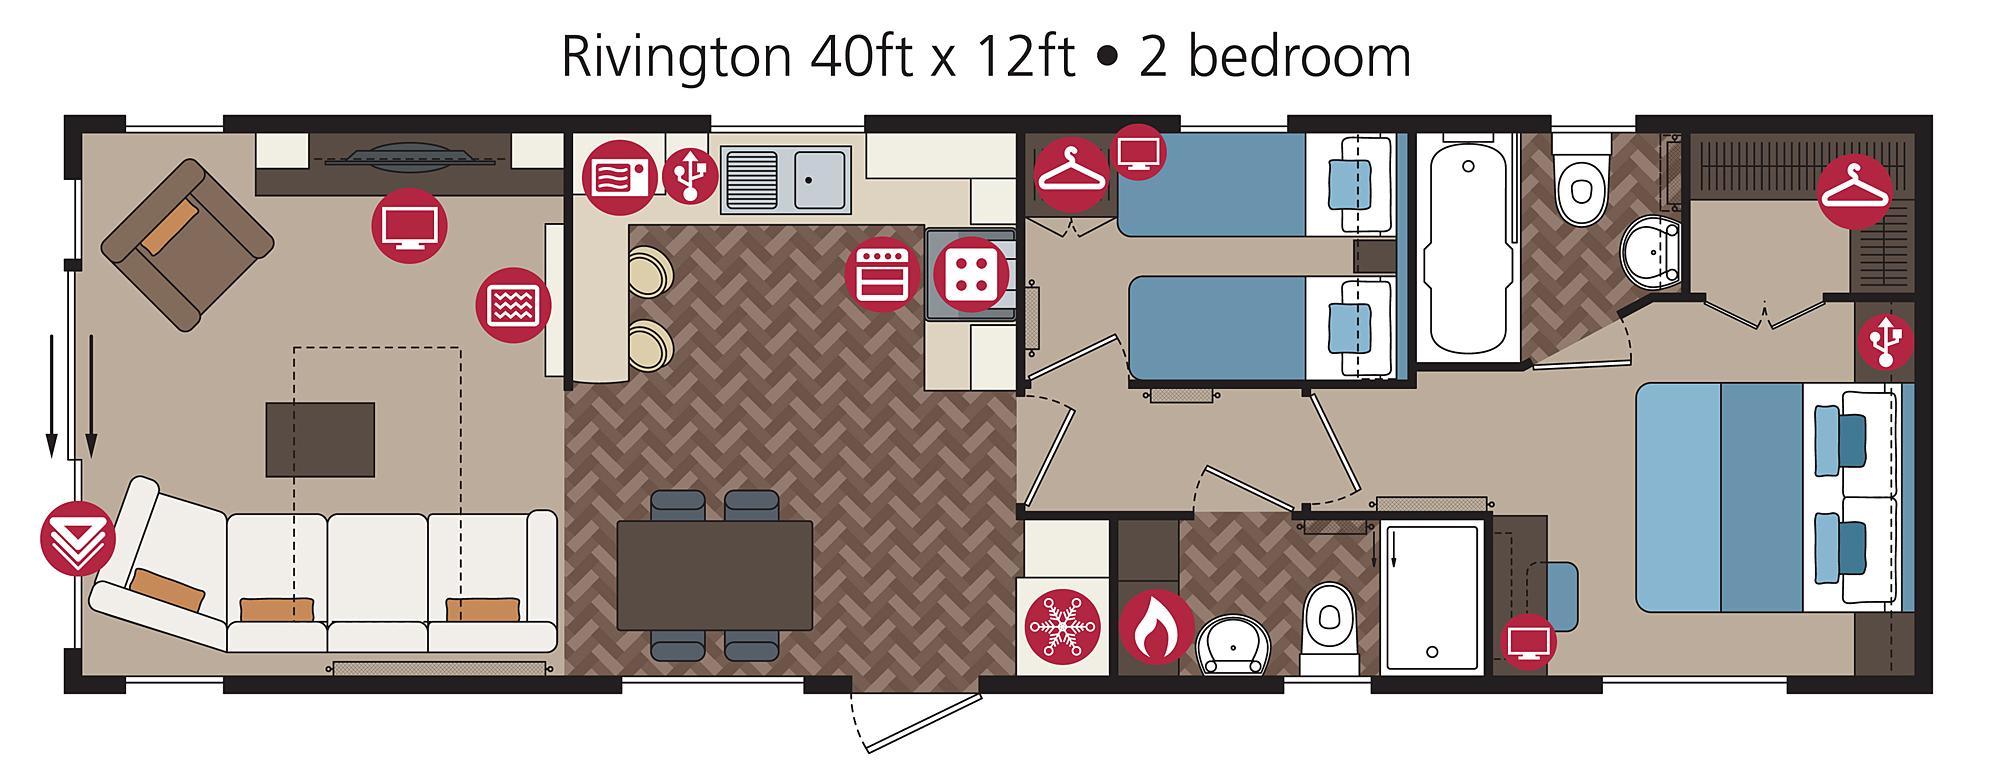 Rivington floorplan